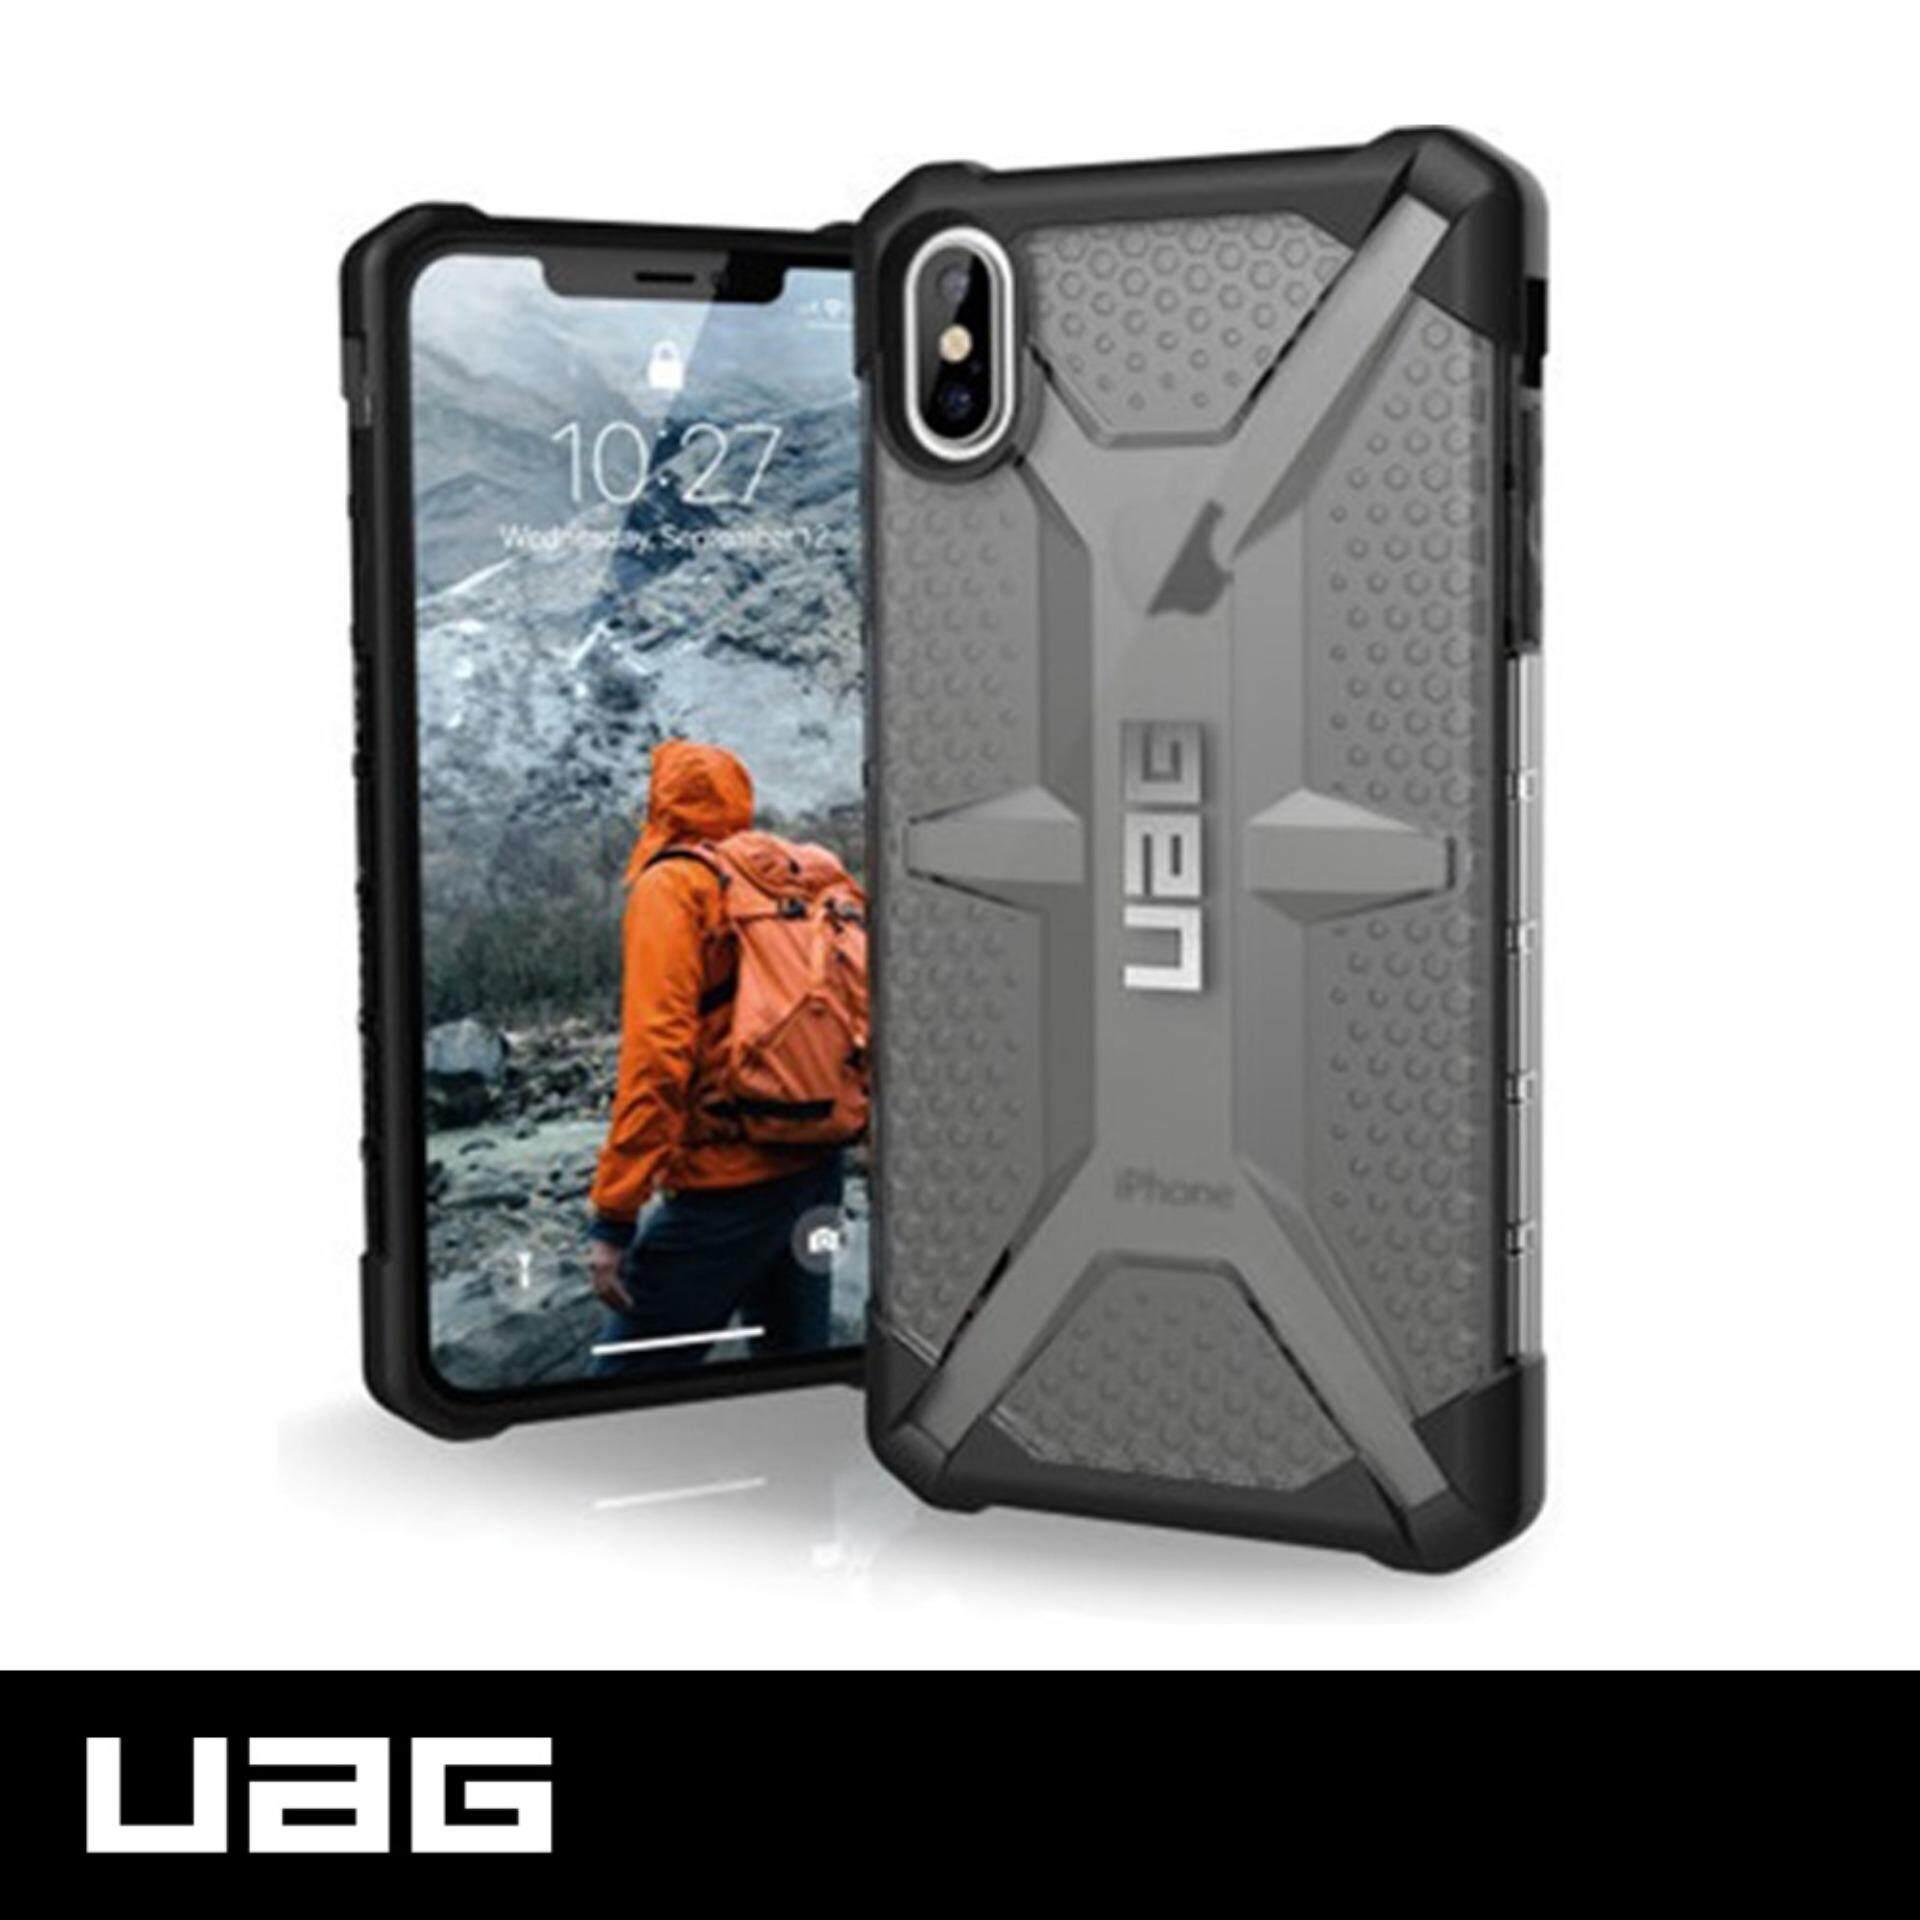 new styles 146fb 1e58f URBAN ARMOR GEAR Phone Cases price in Malaysia - Best URBAN ARMOR ...